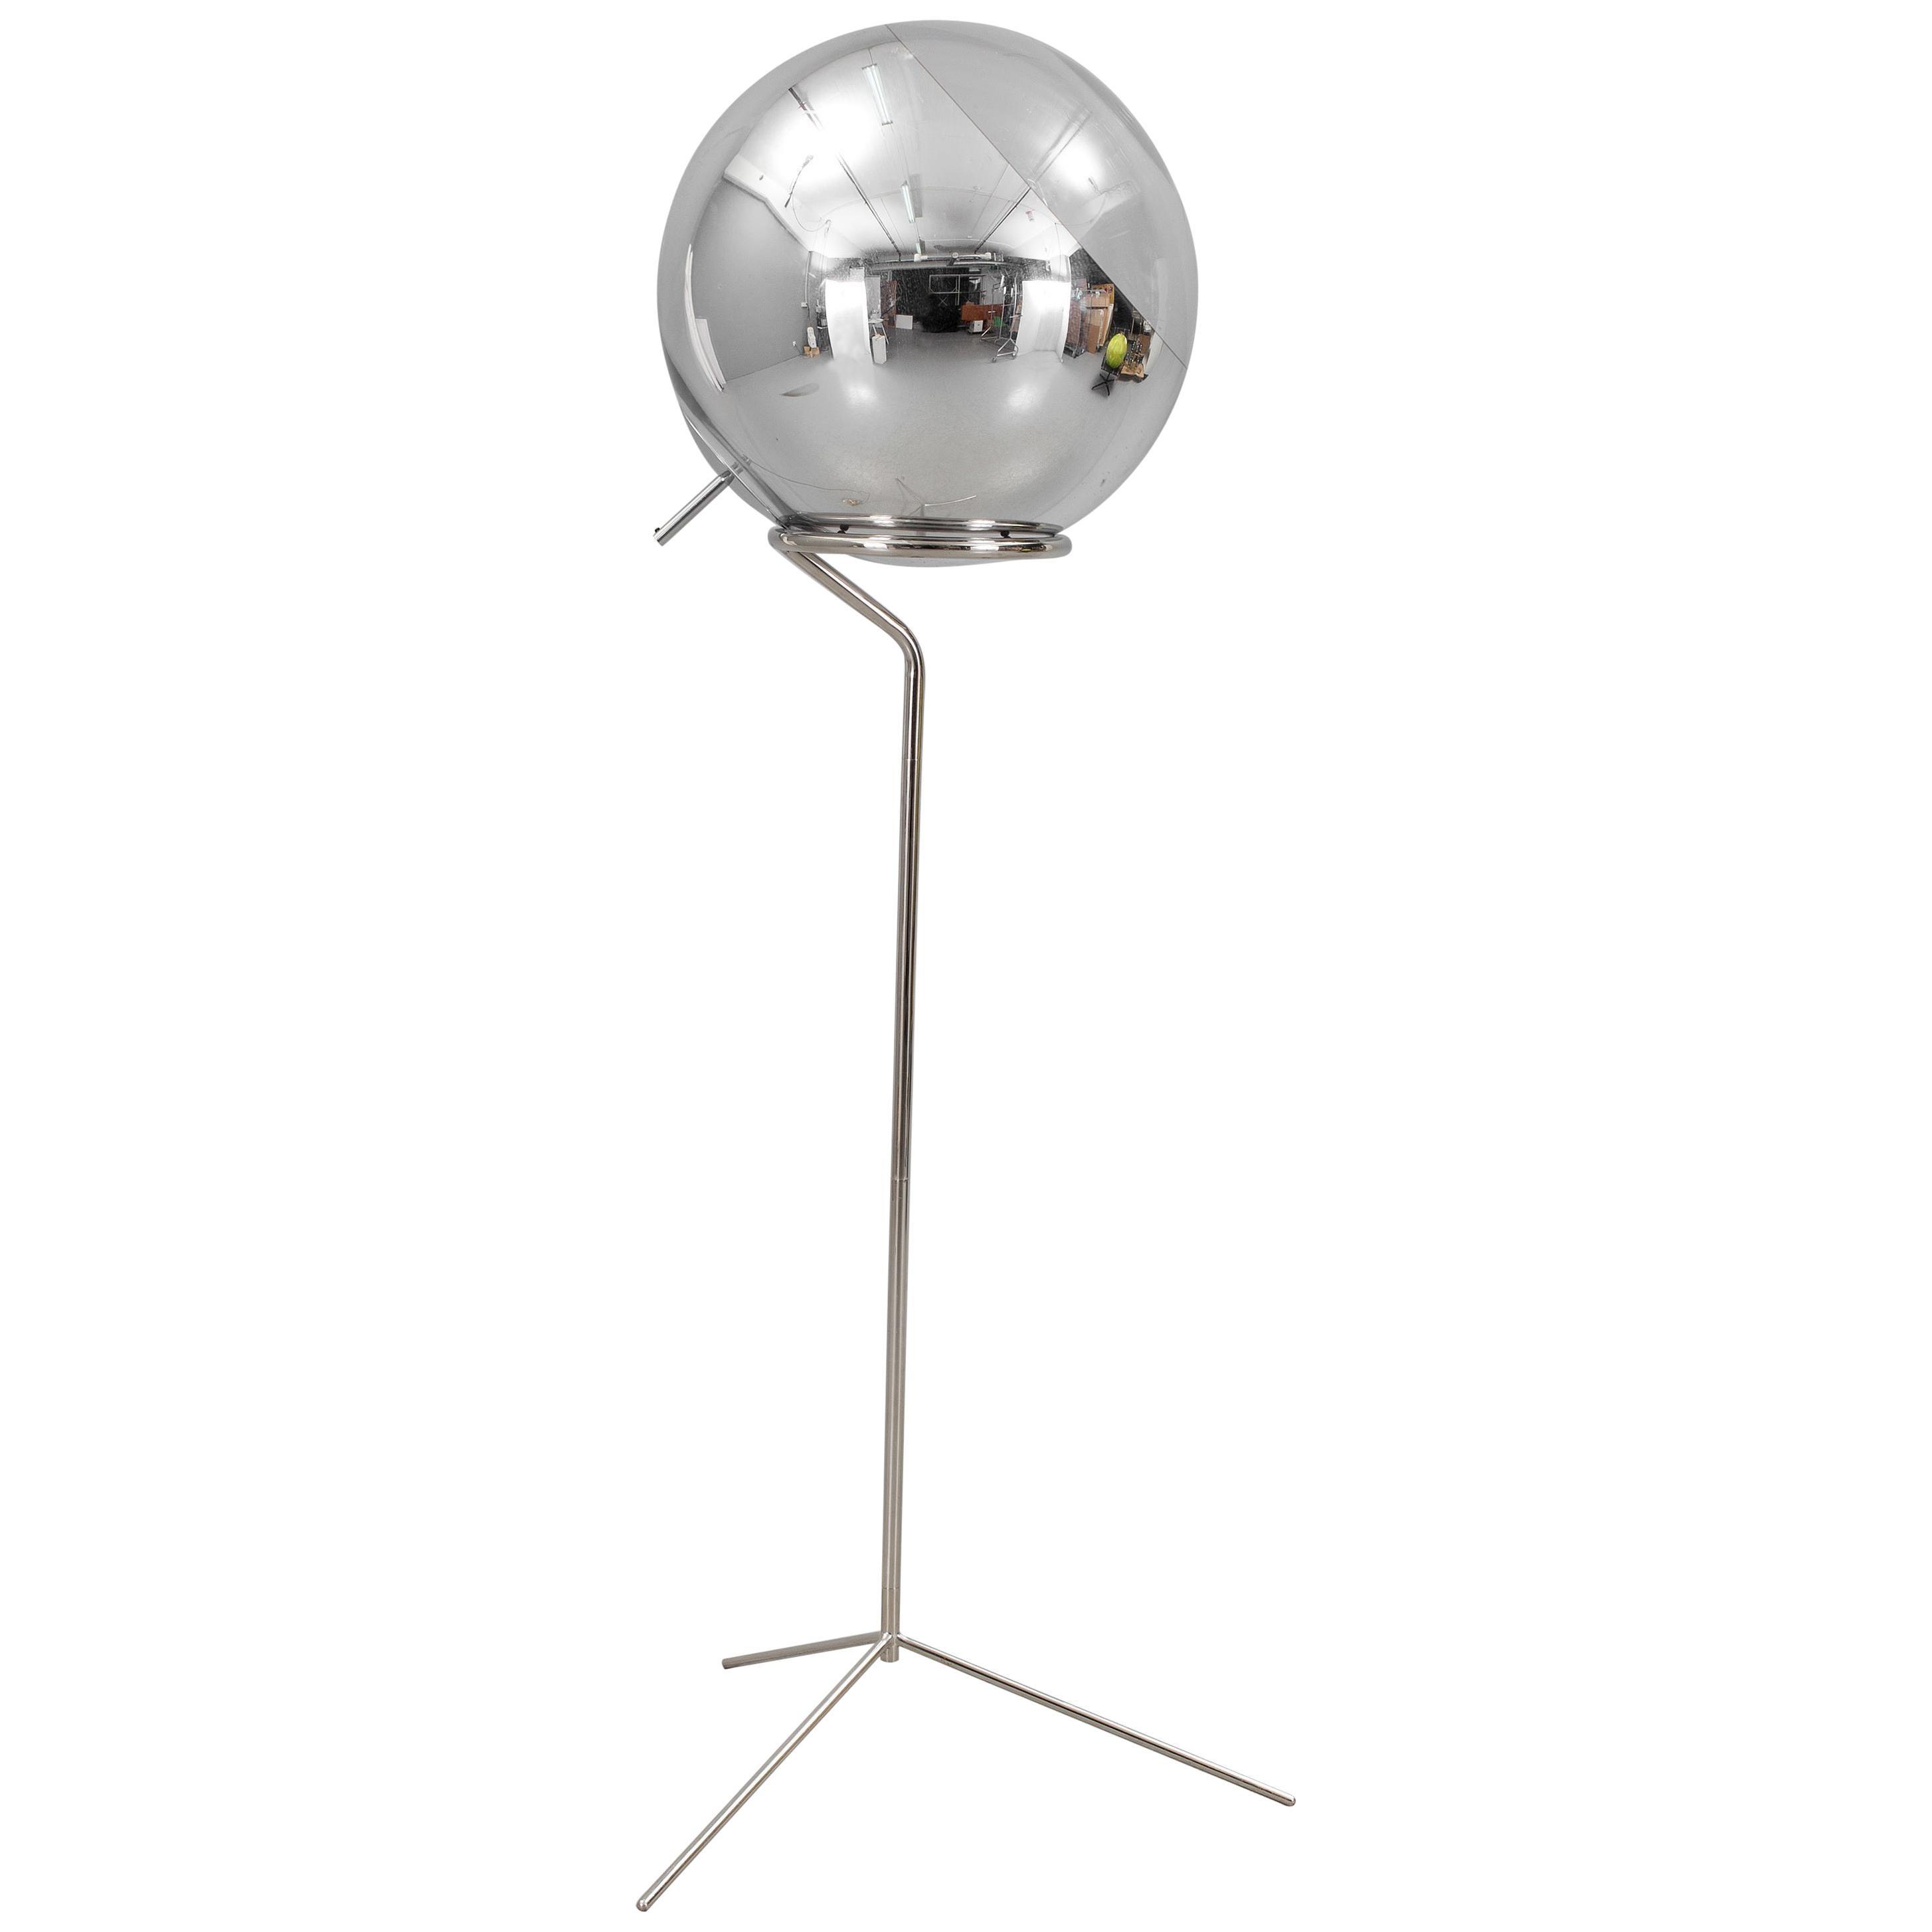 Mirror Ball Floor Light by Tom Dixon